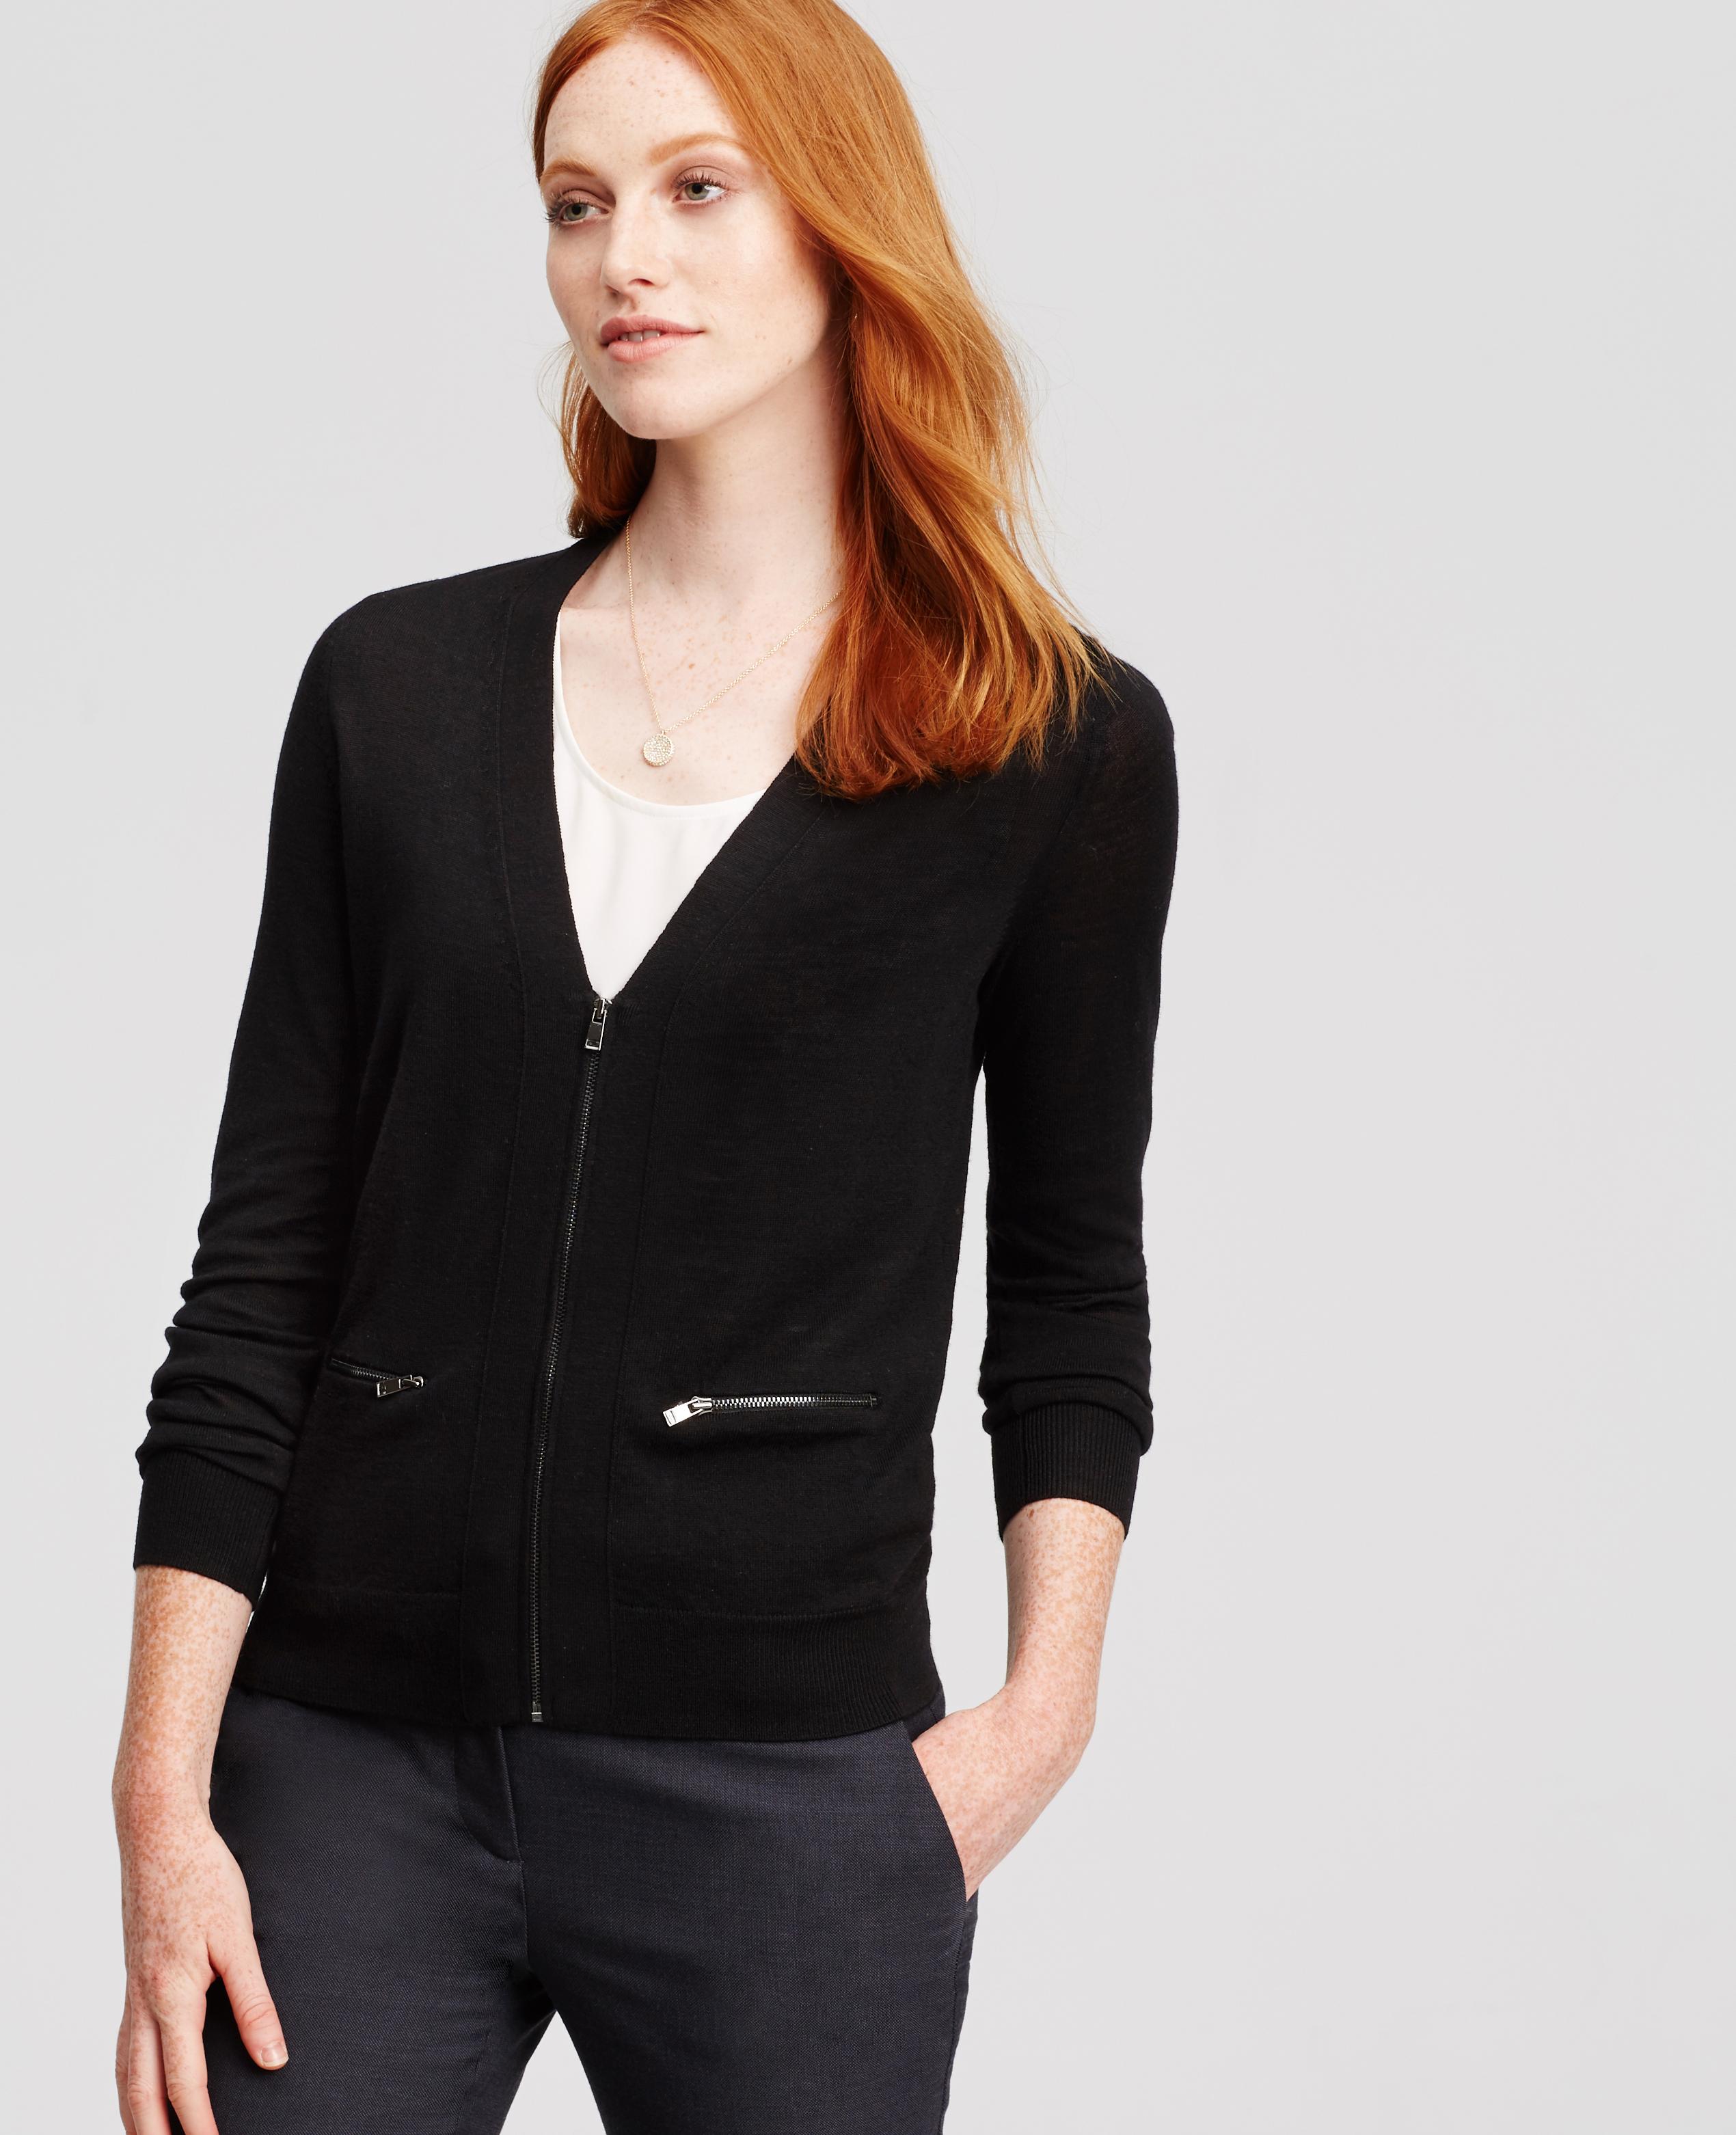 Ann taylor Petite Merino Wool Zip Cardigan in Black | Lyst